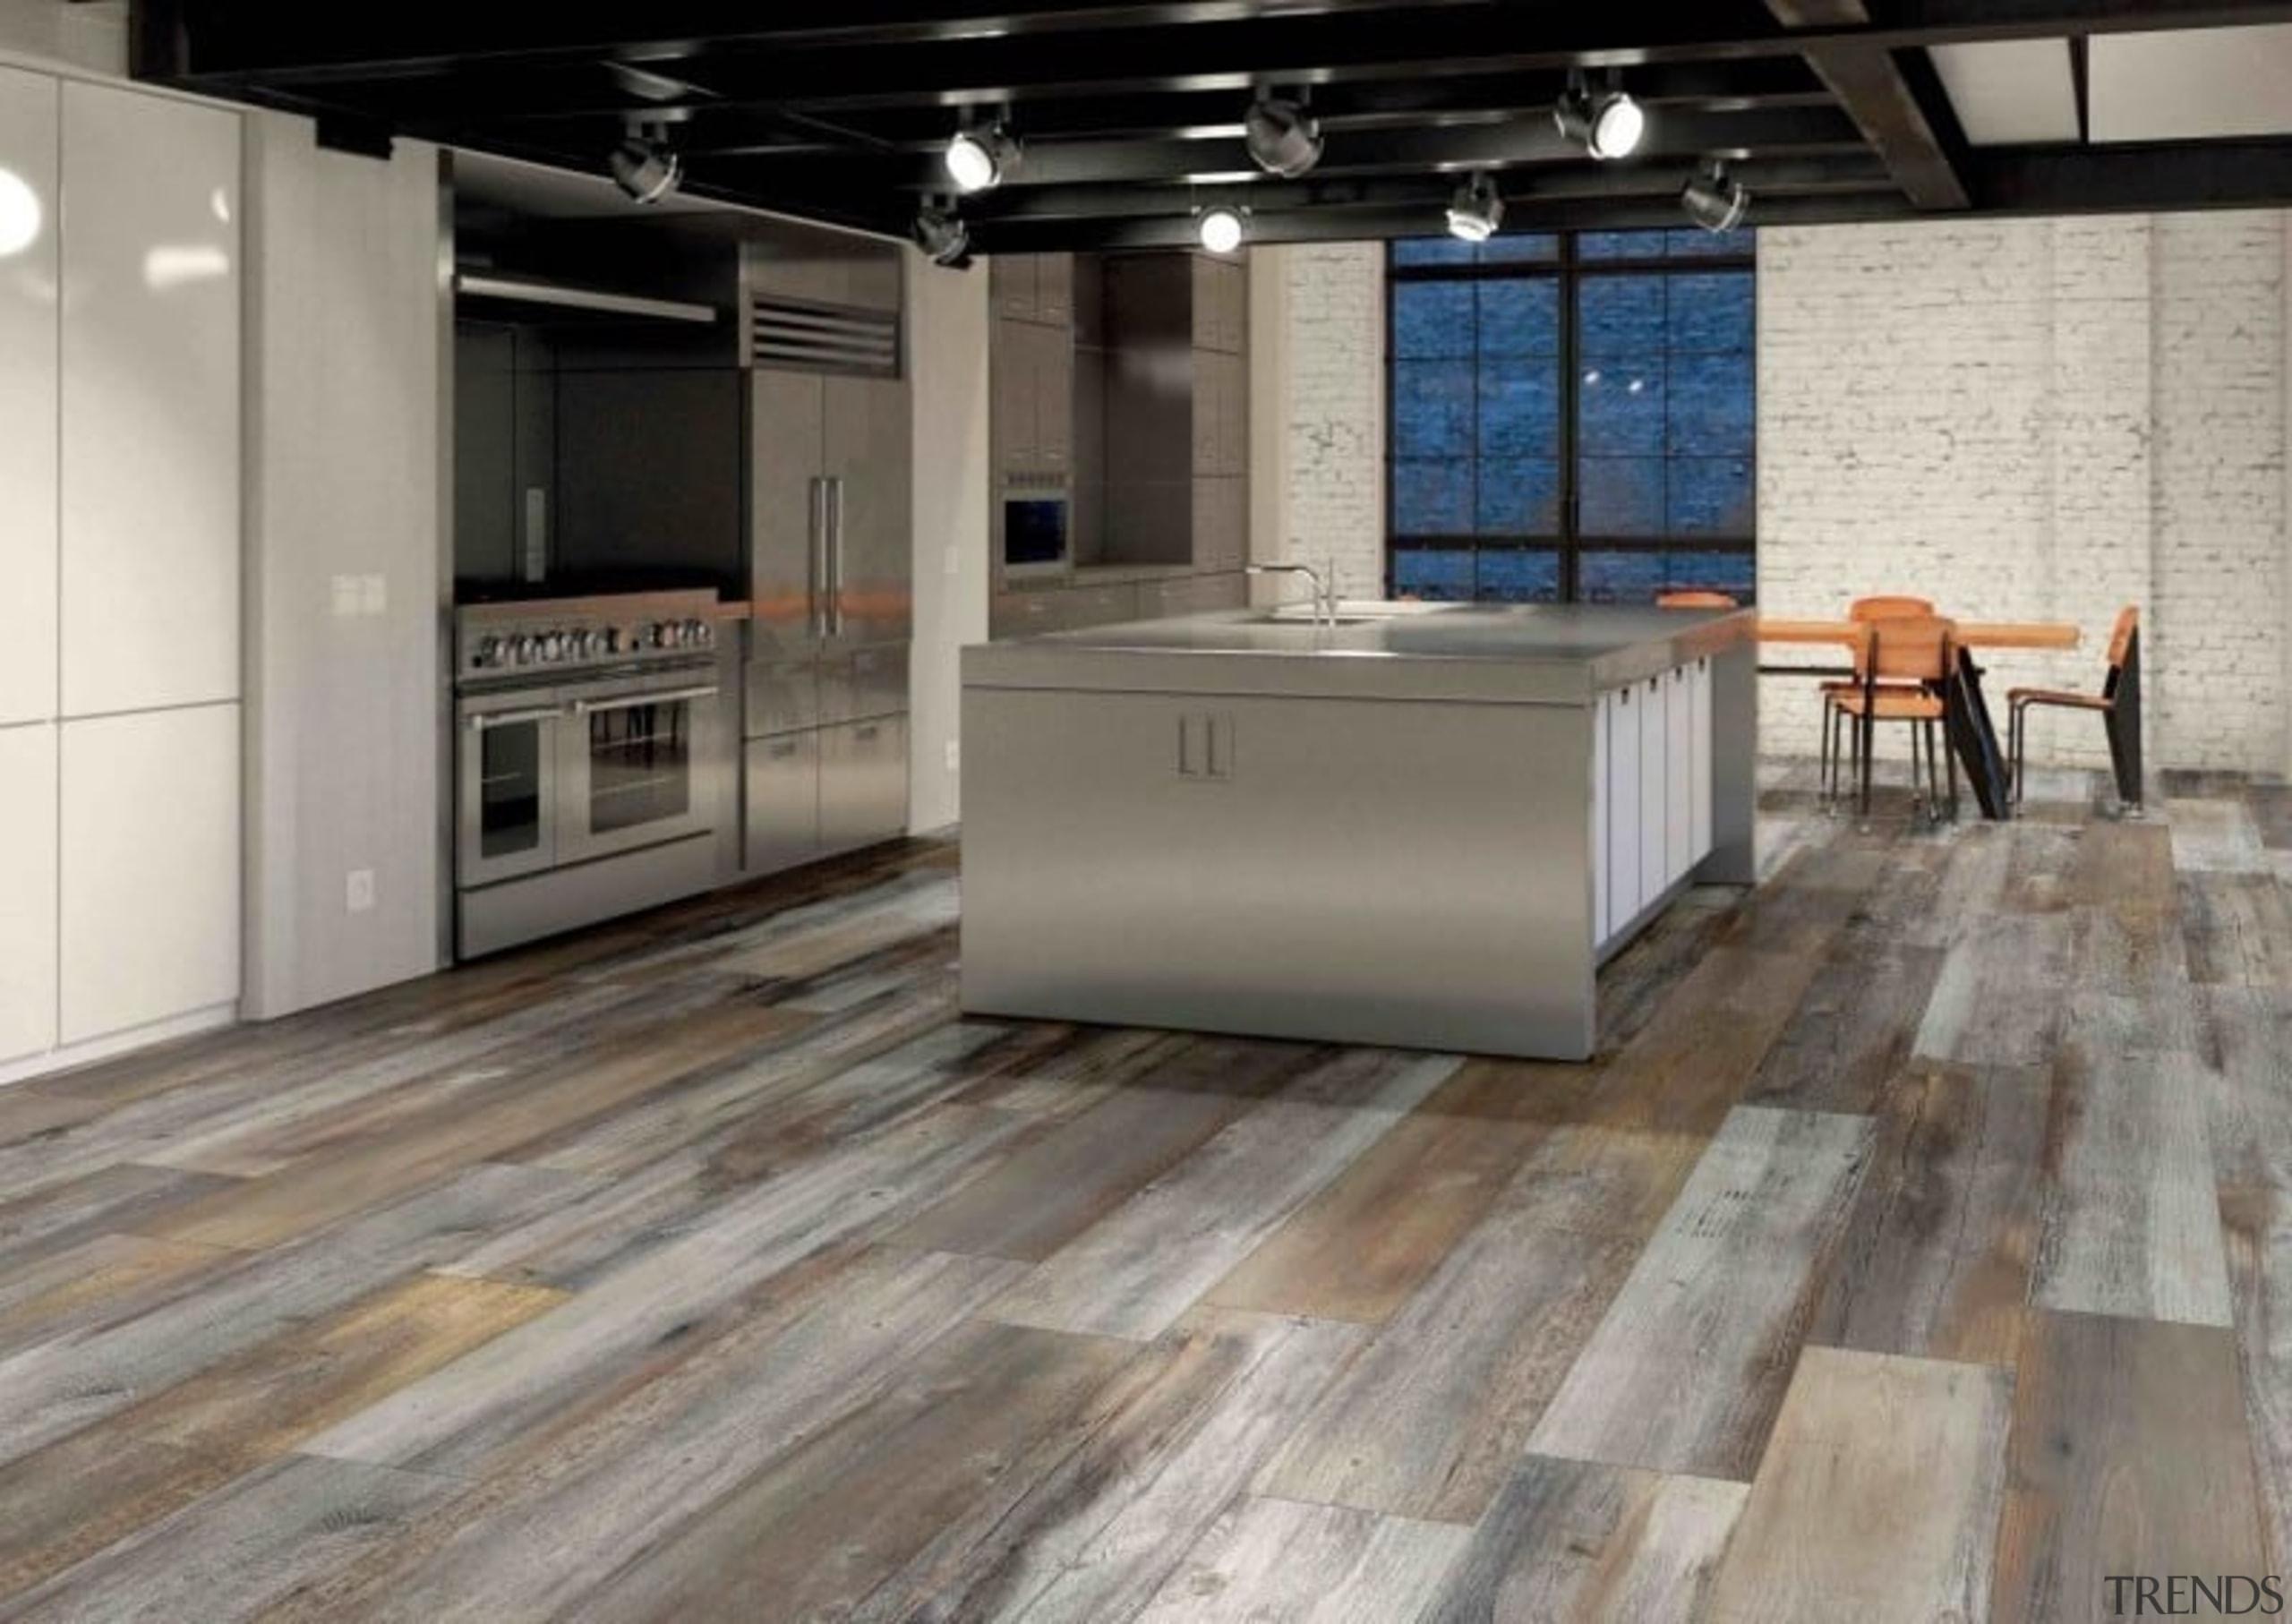 An Italian made tile that has all the floor, flooring, hardwood, kitchen, laminate flooring, tile, wood, wood flooring, gray